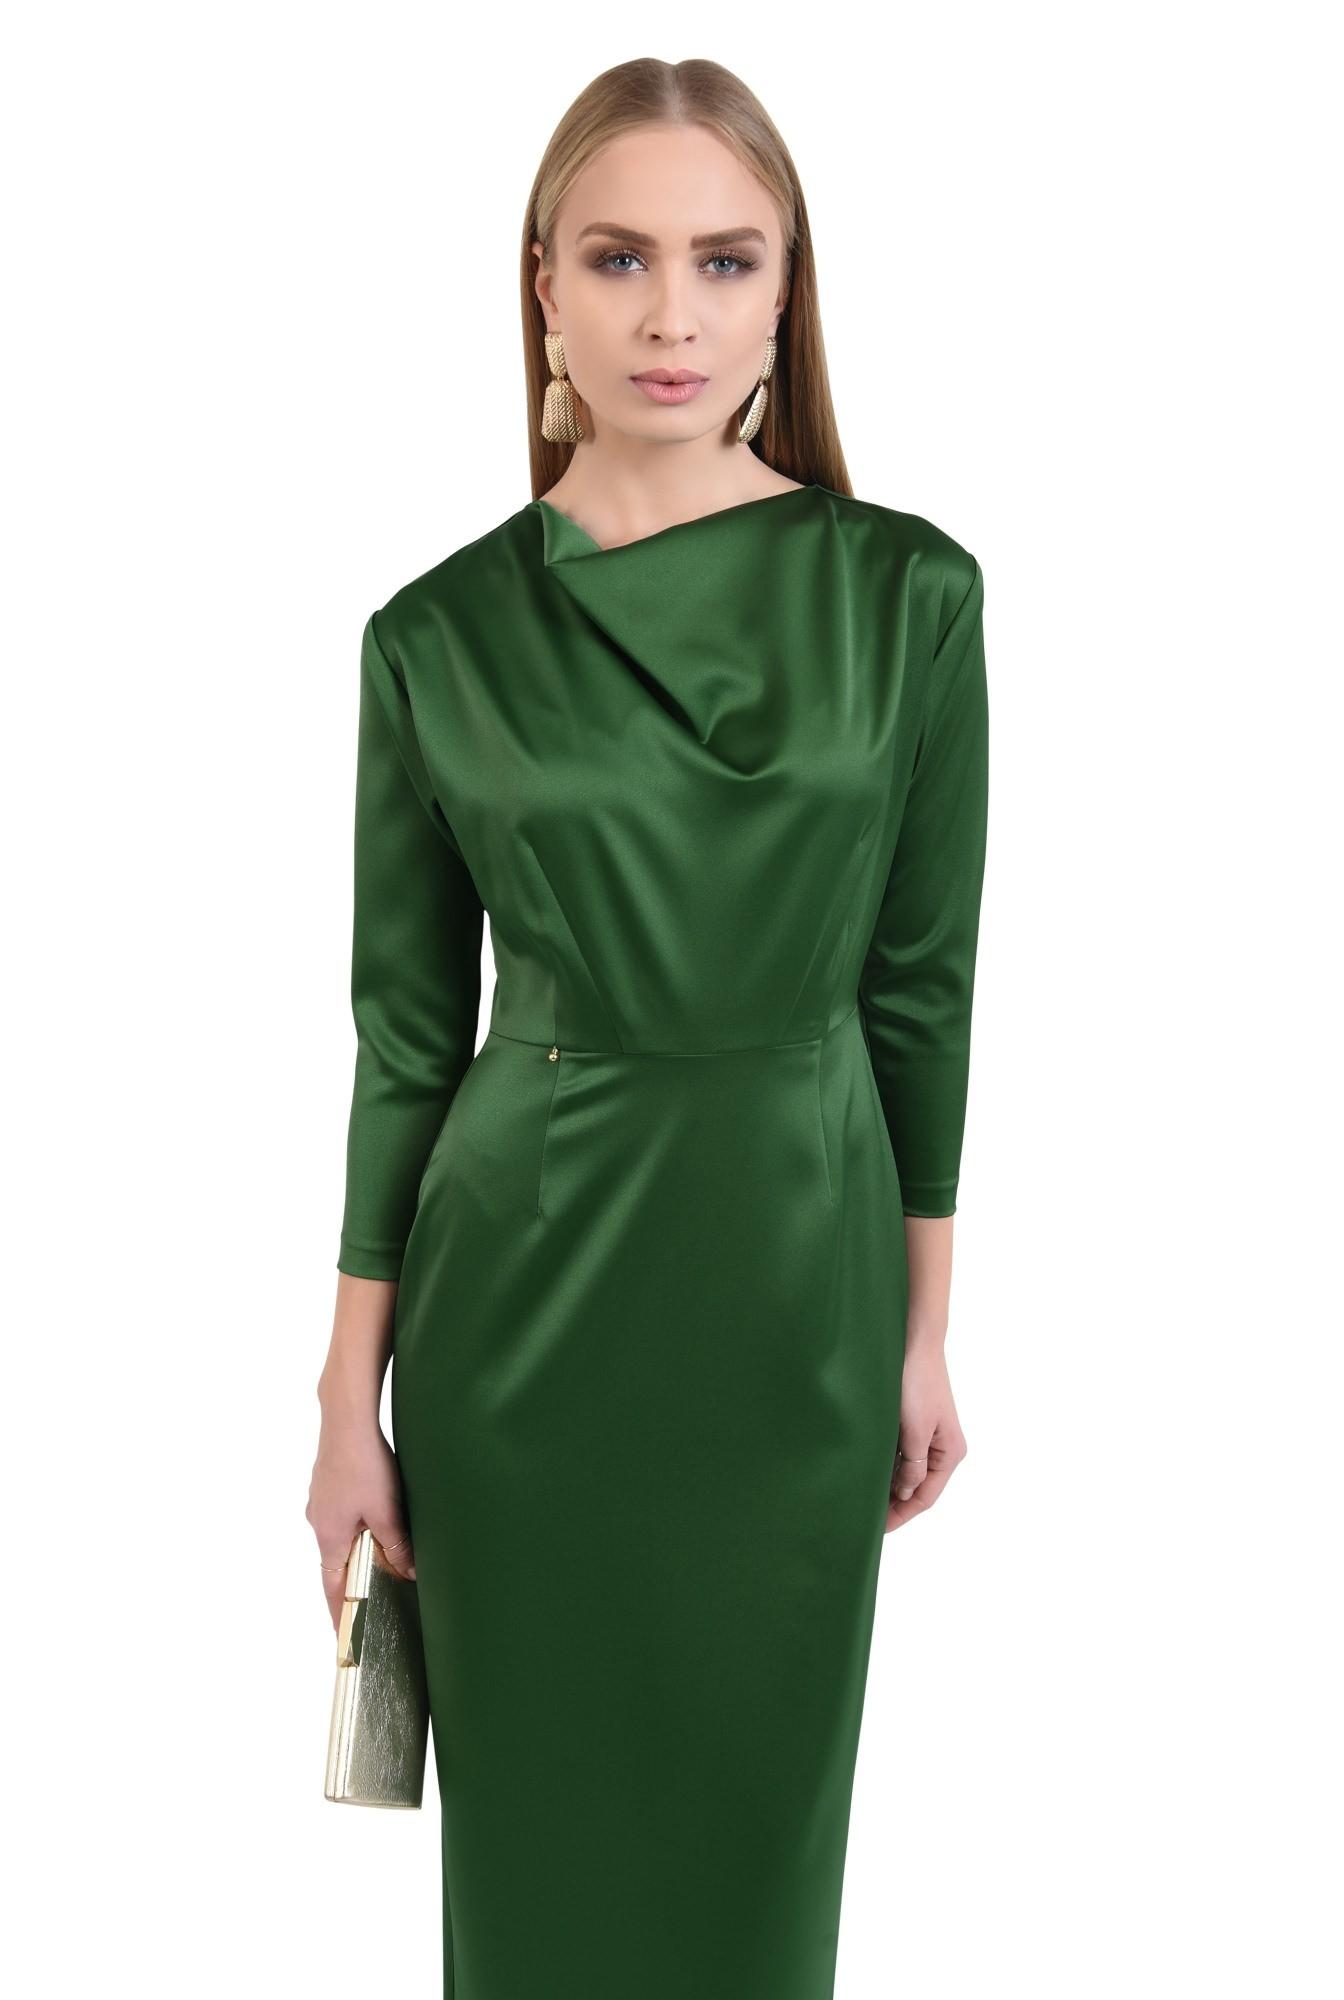 2 - rochie de ocazie, verde, maneci ajustate, drapata la decolteu